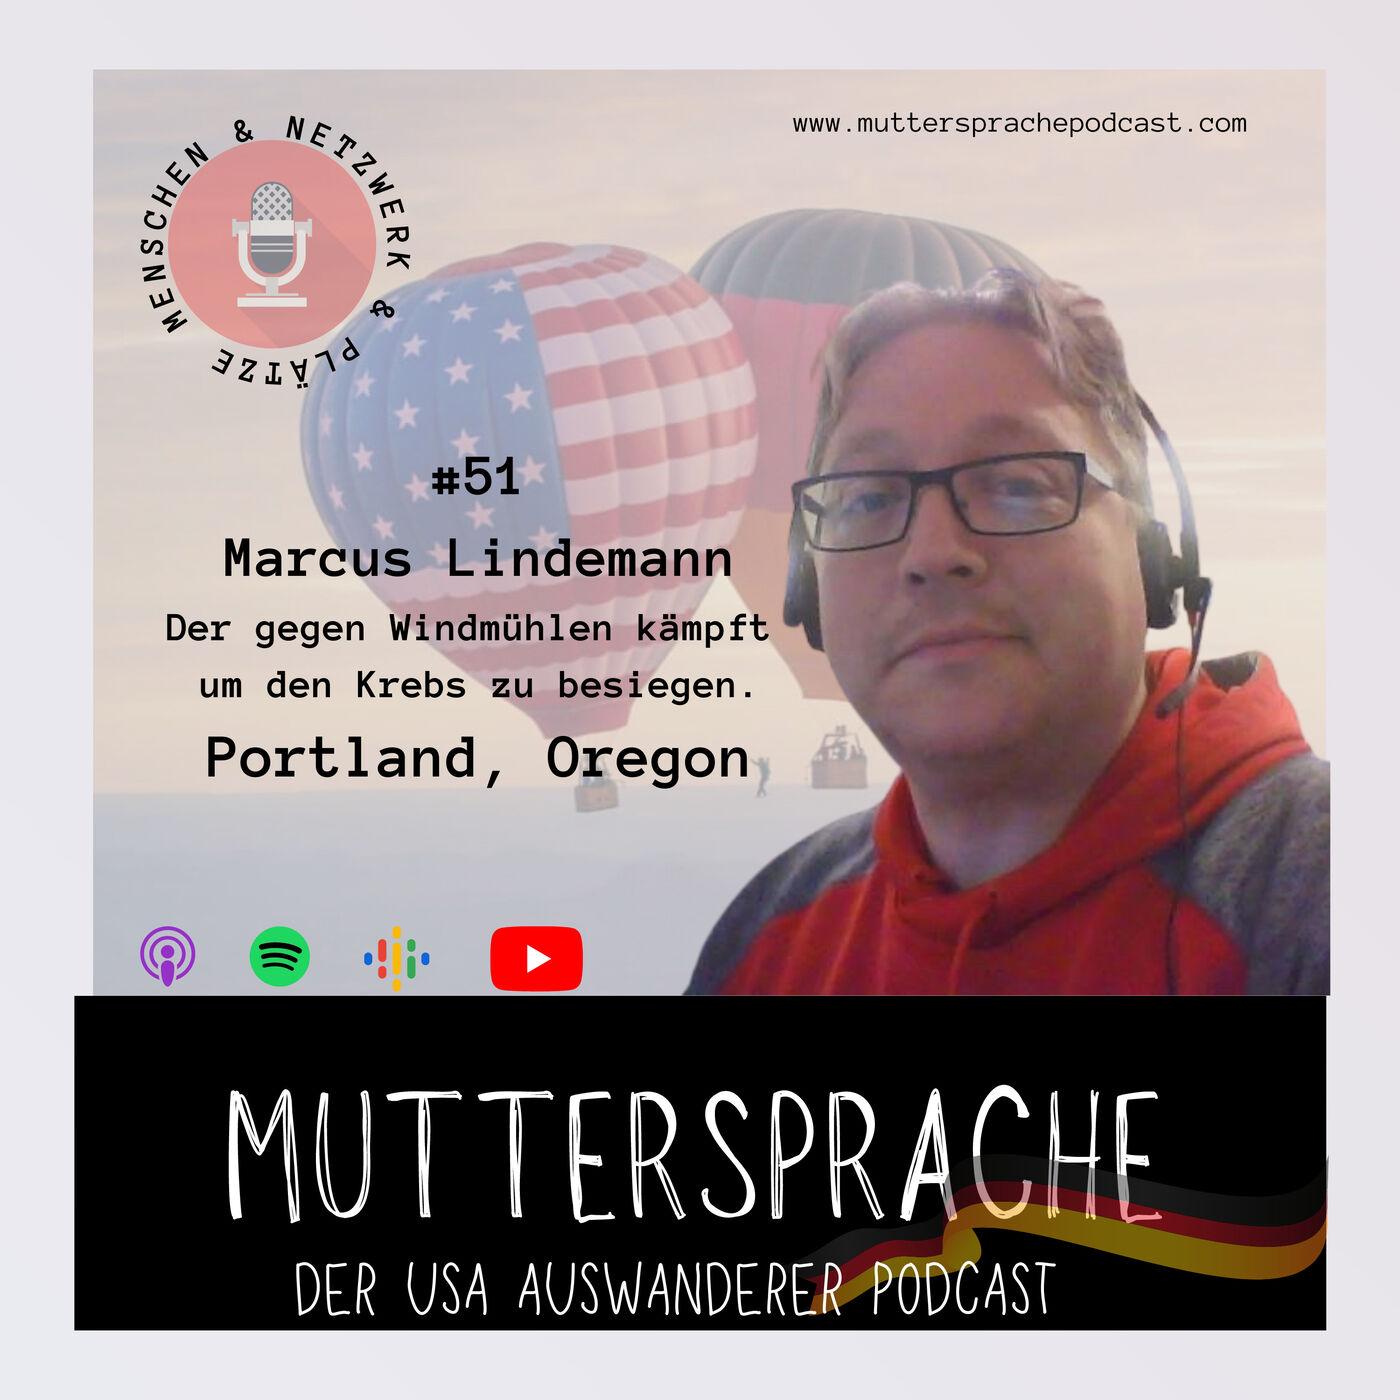 Folge 51: Der gegen Windmühlen kämpft um den Krebs zu besiegen! MARCUS LINDEMANN - Portland, Oregon